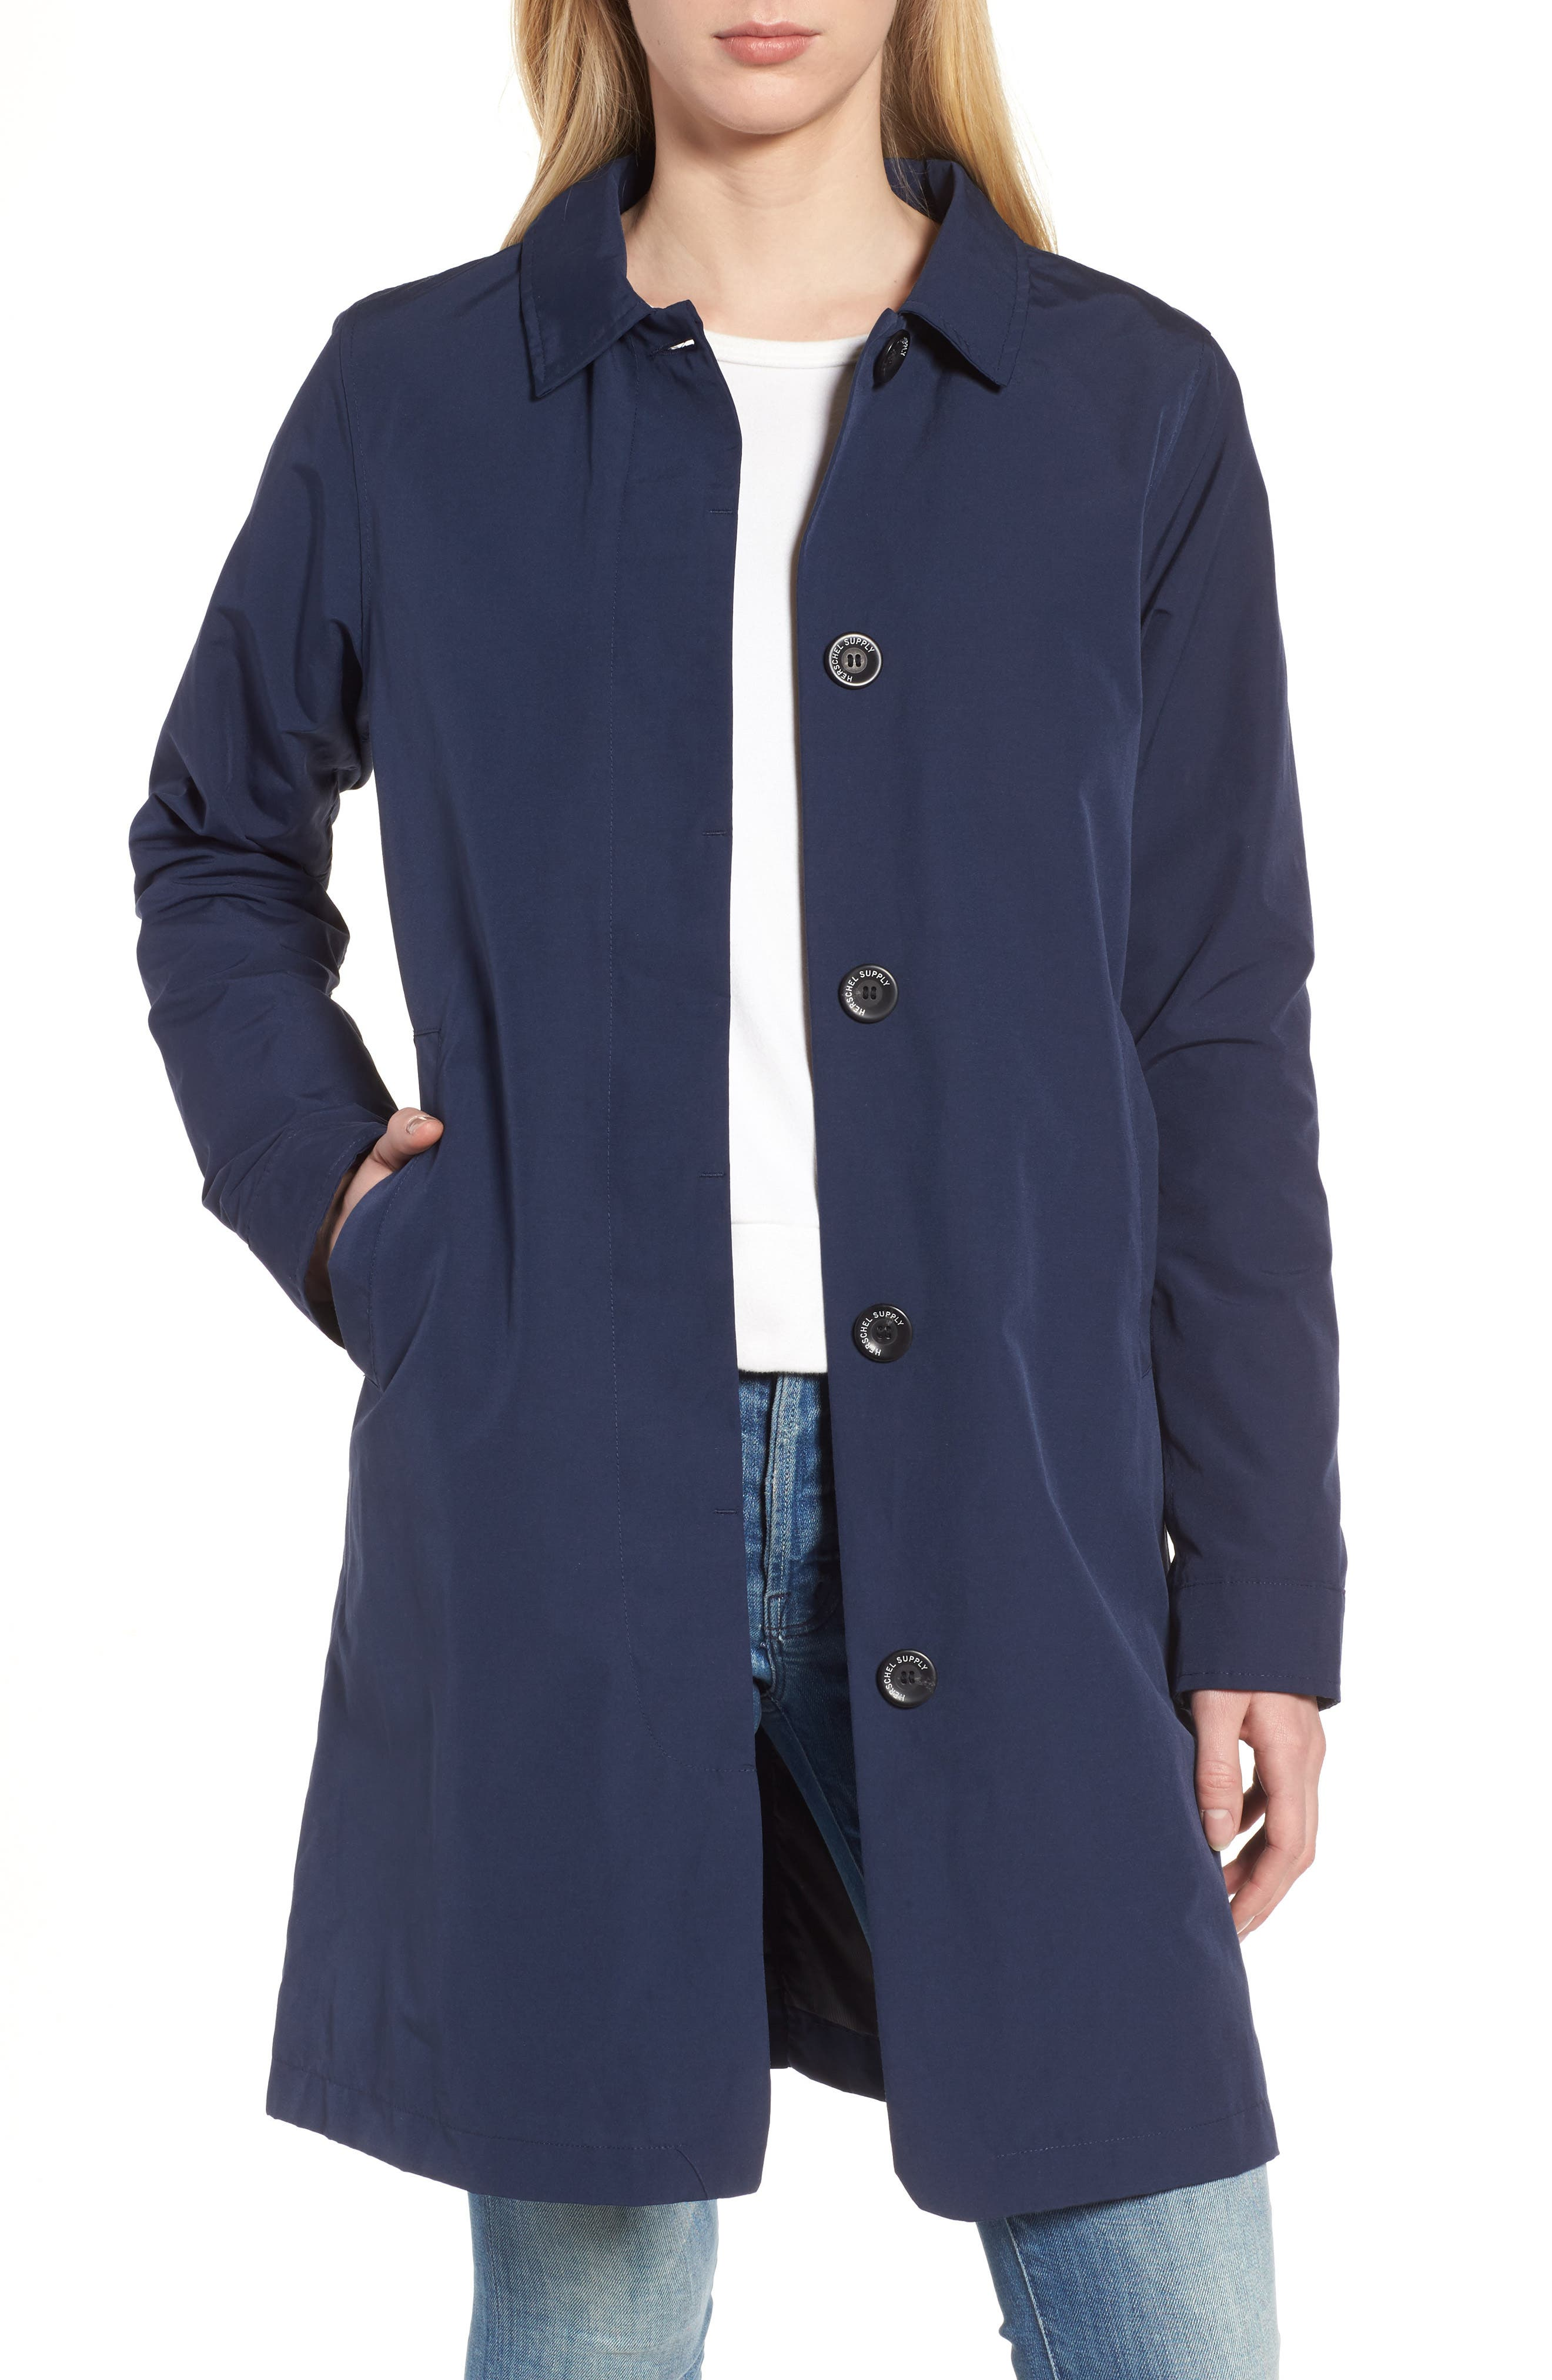 Main Image - Herschel Supply Co. Mac Jacket